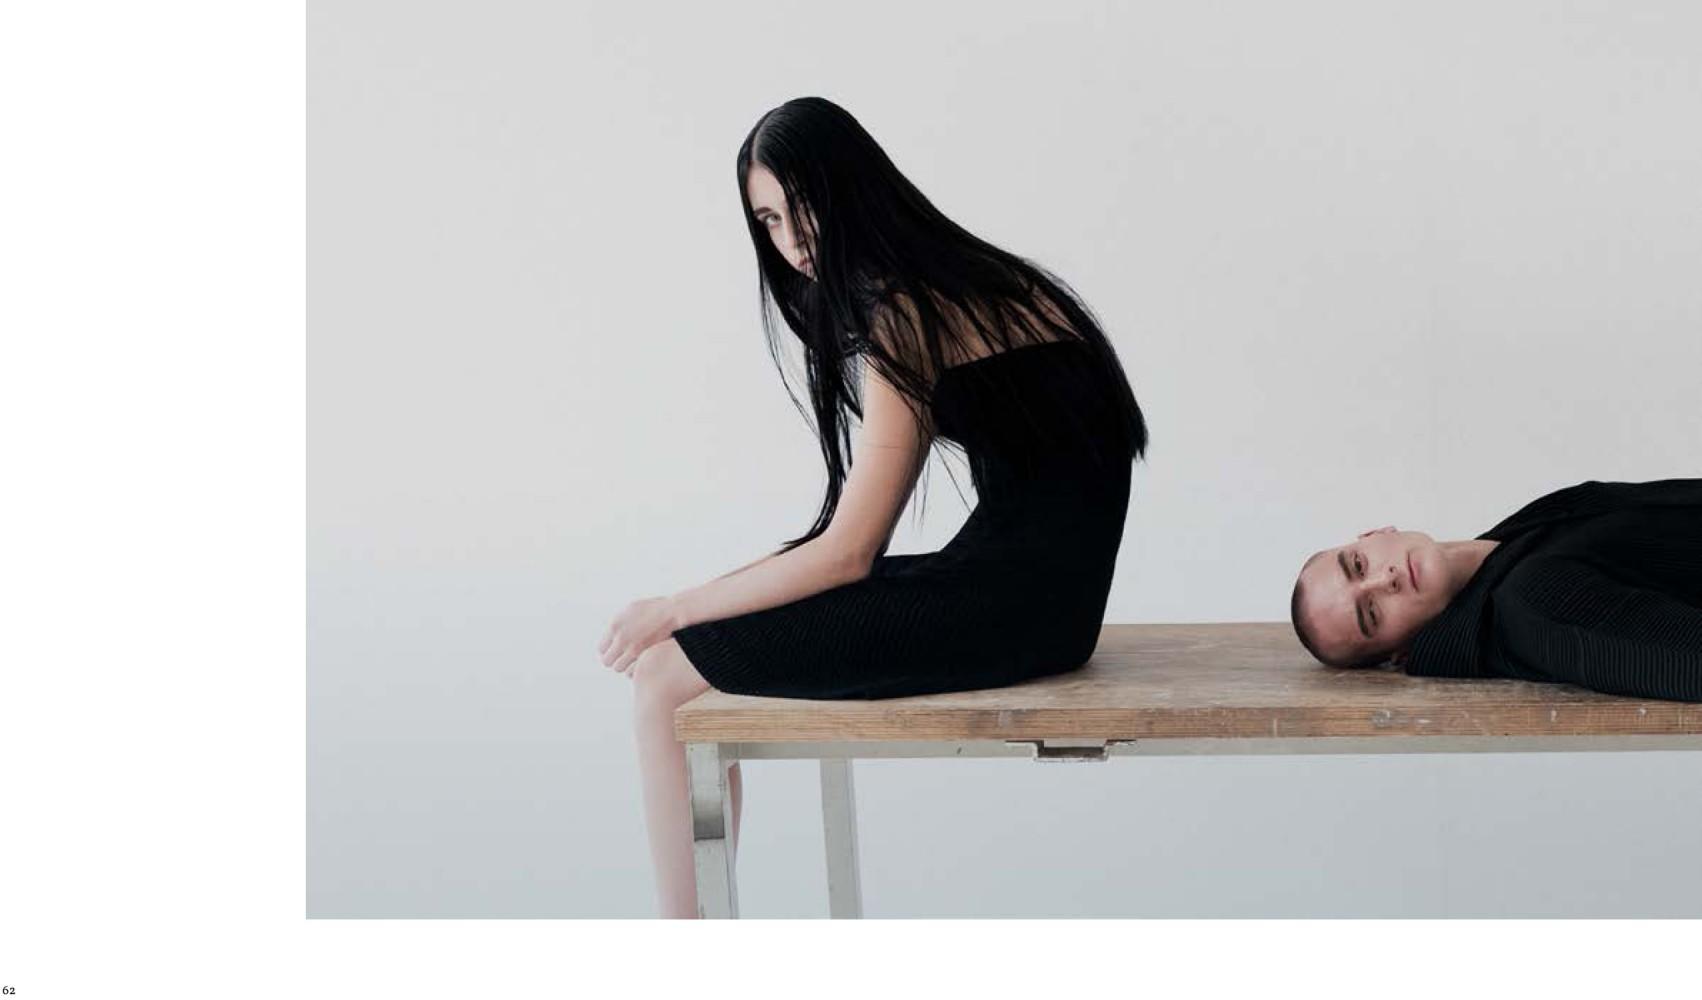 Monica-Menez-Fotostrecke-Magazin-8